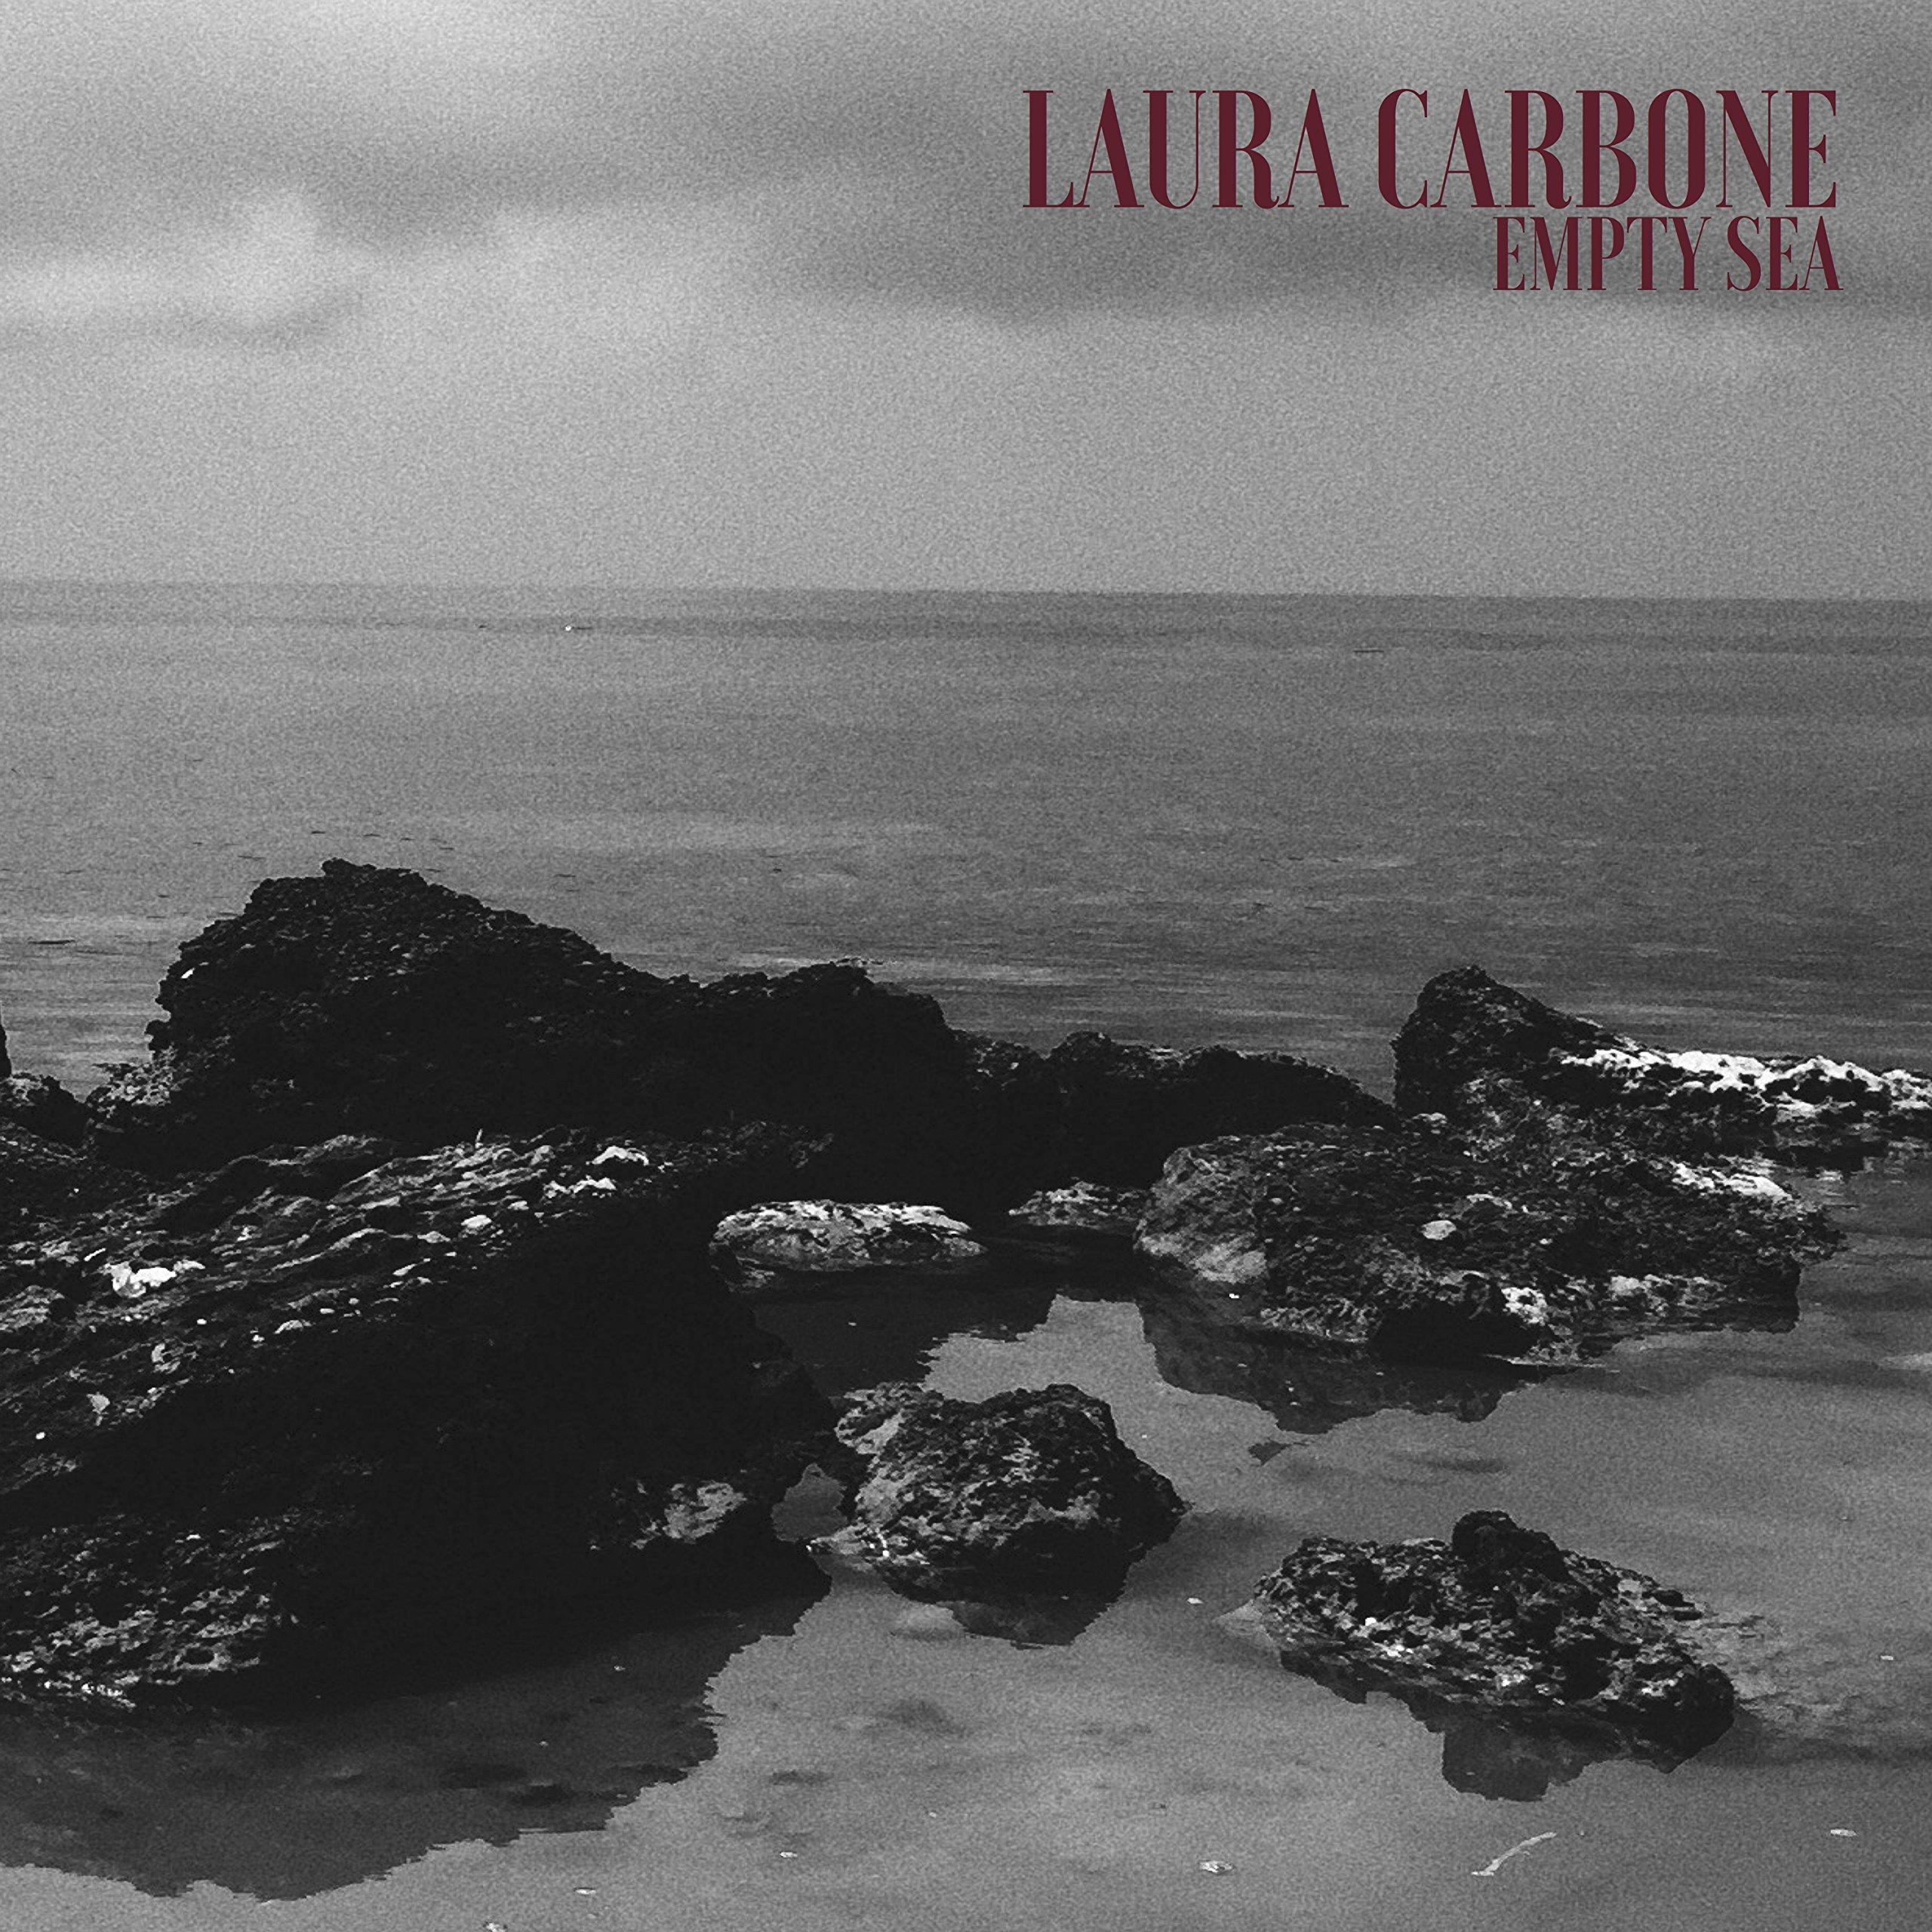 Vinilo : Laura Carbone - Empty Sea (LP Vinyl)